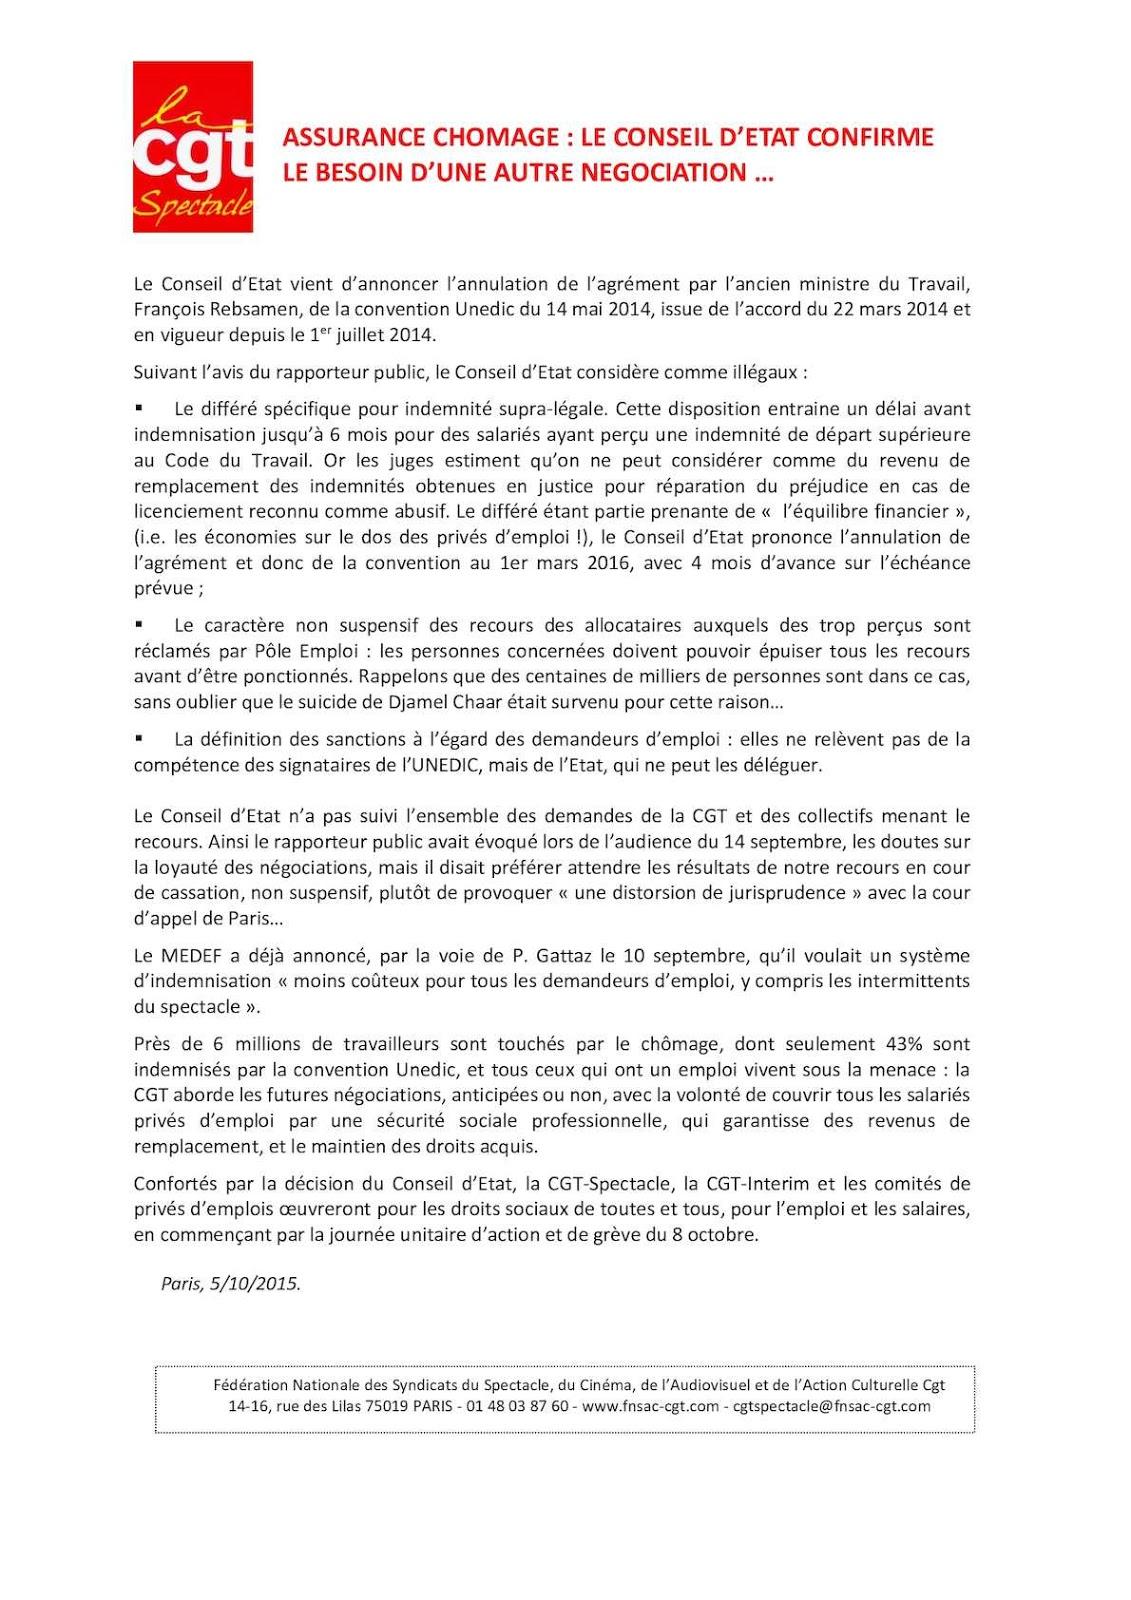 Chen Gai France Trop Percu Pole Emploi